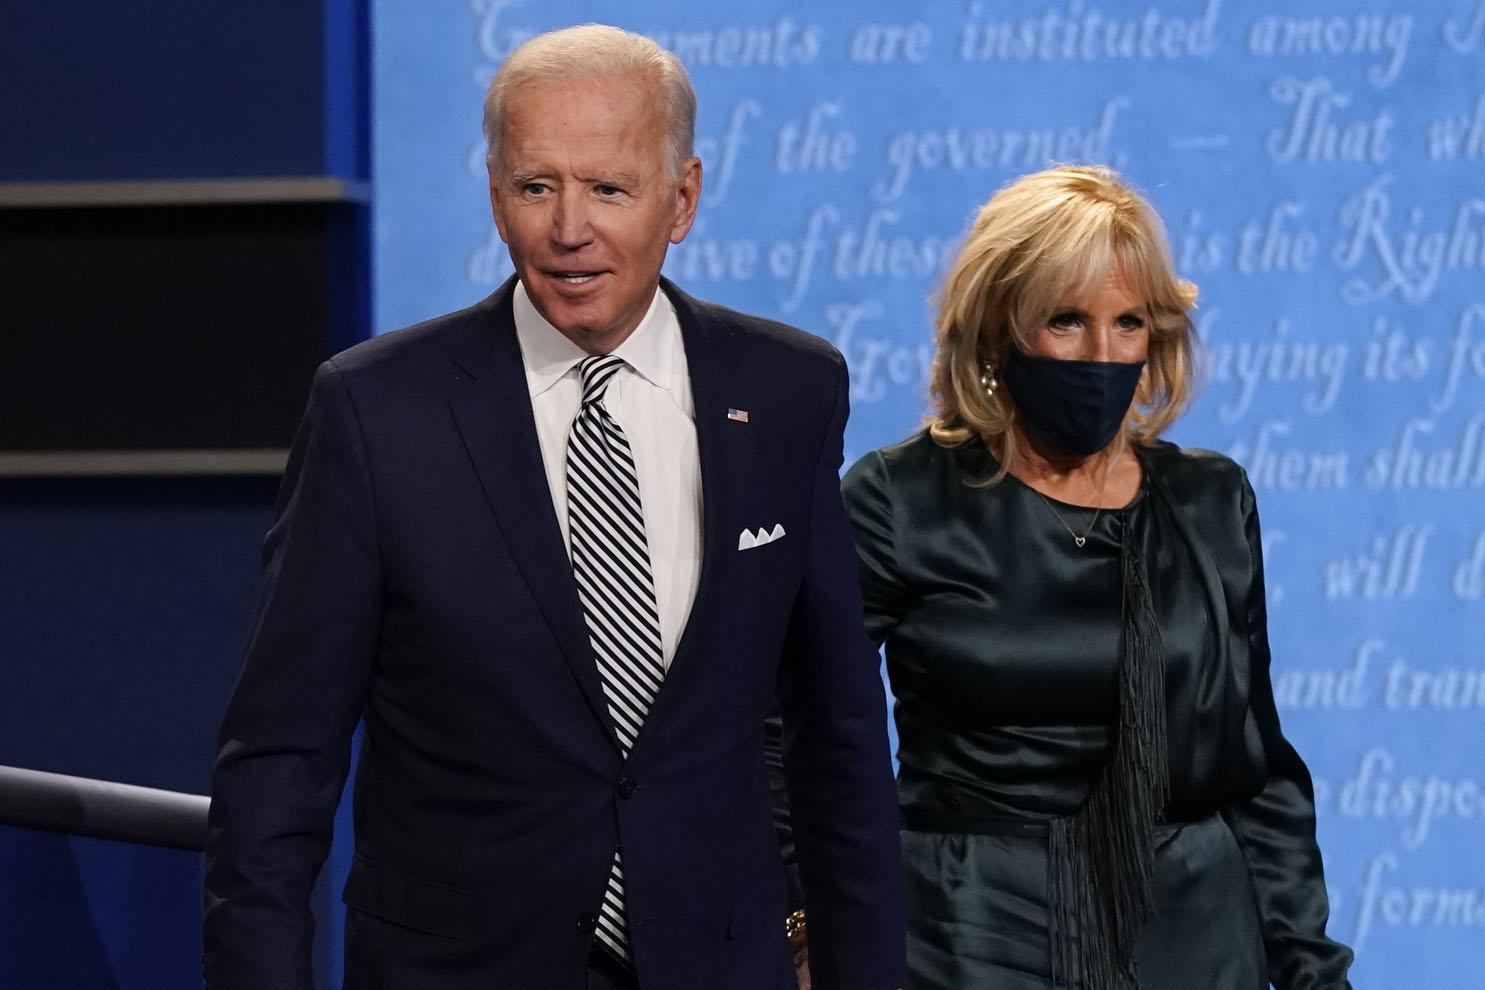 Former Vice President Joe Biden and his wife Jill Biden during the first presidential debate Tuesday, Sept. 29, 2020.